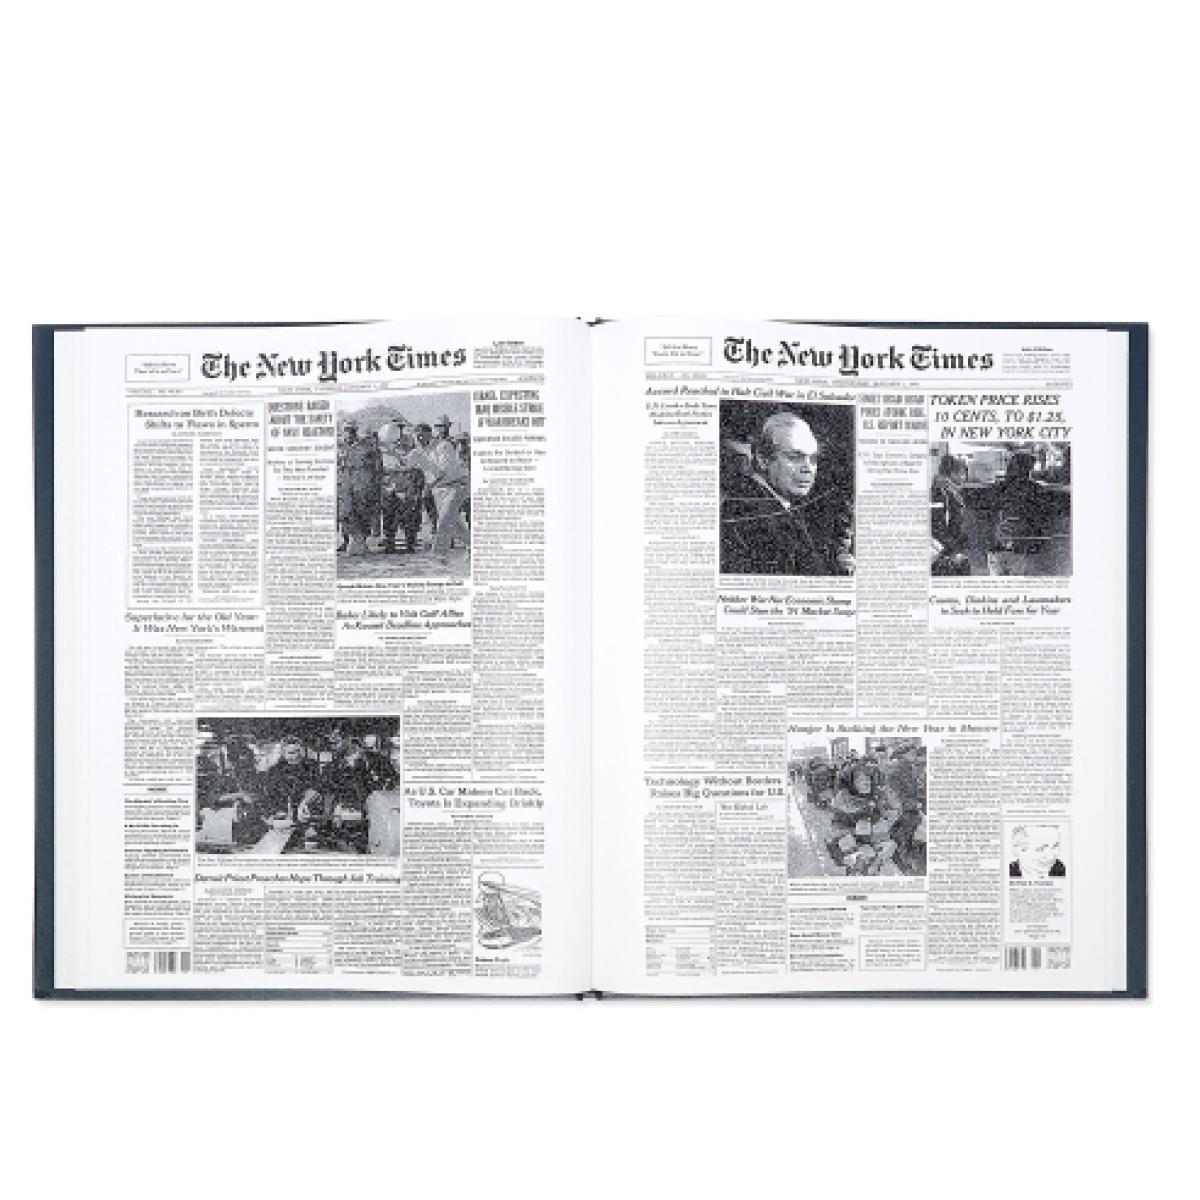 The New York Times New York Times Custom Birthday Book